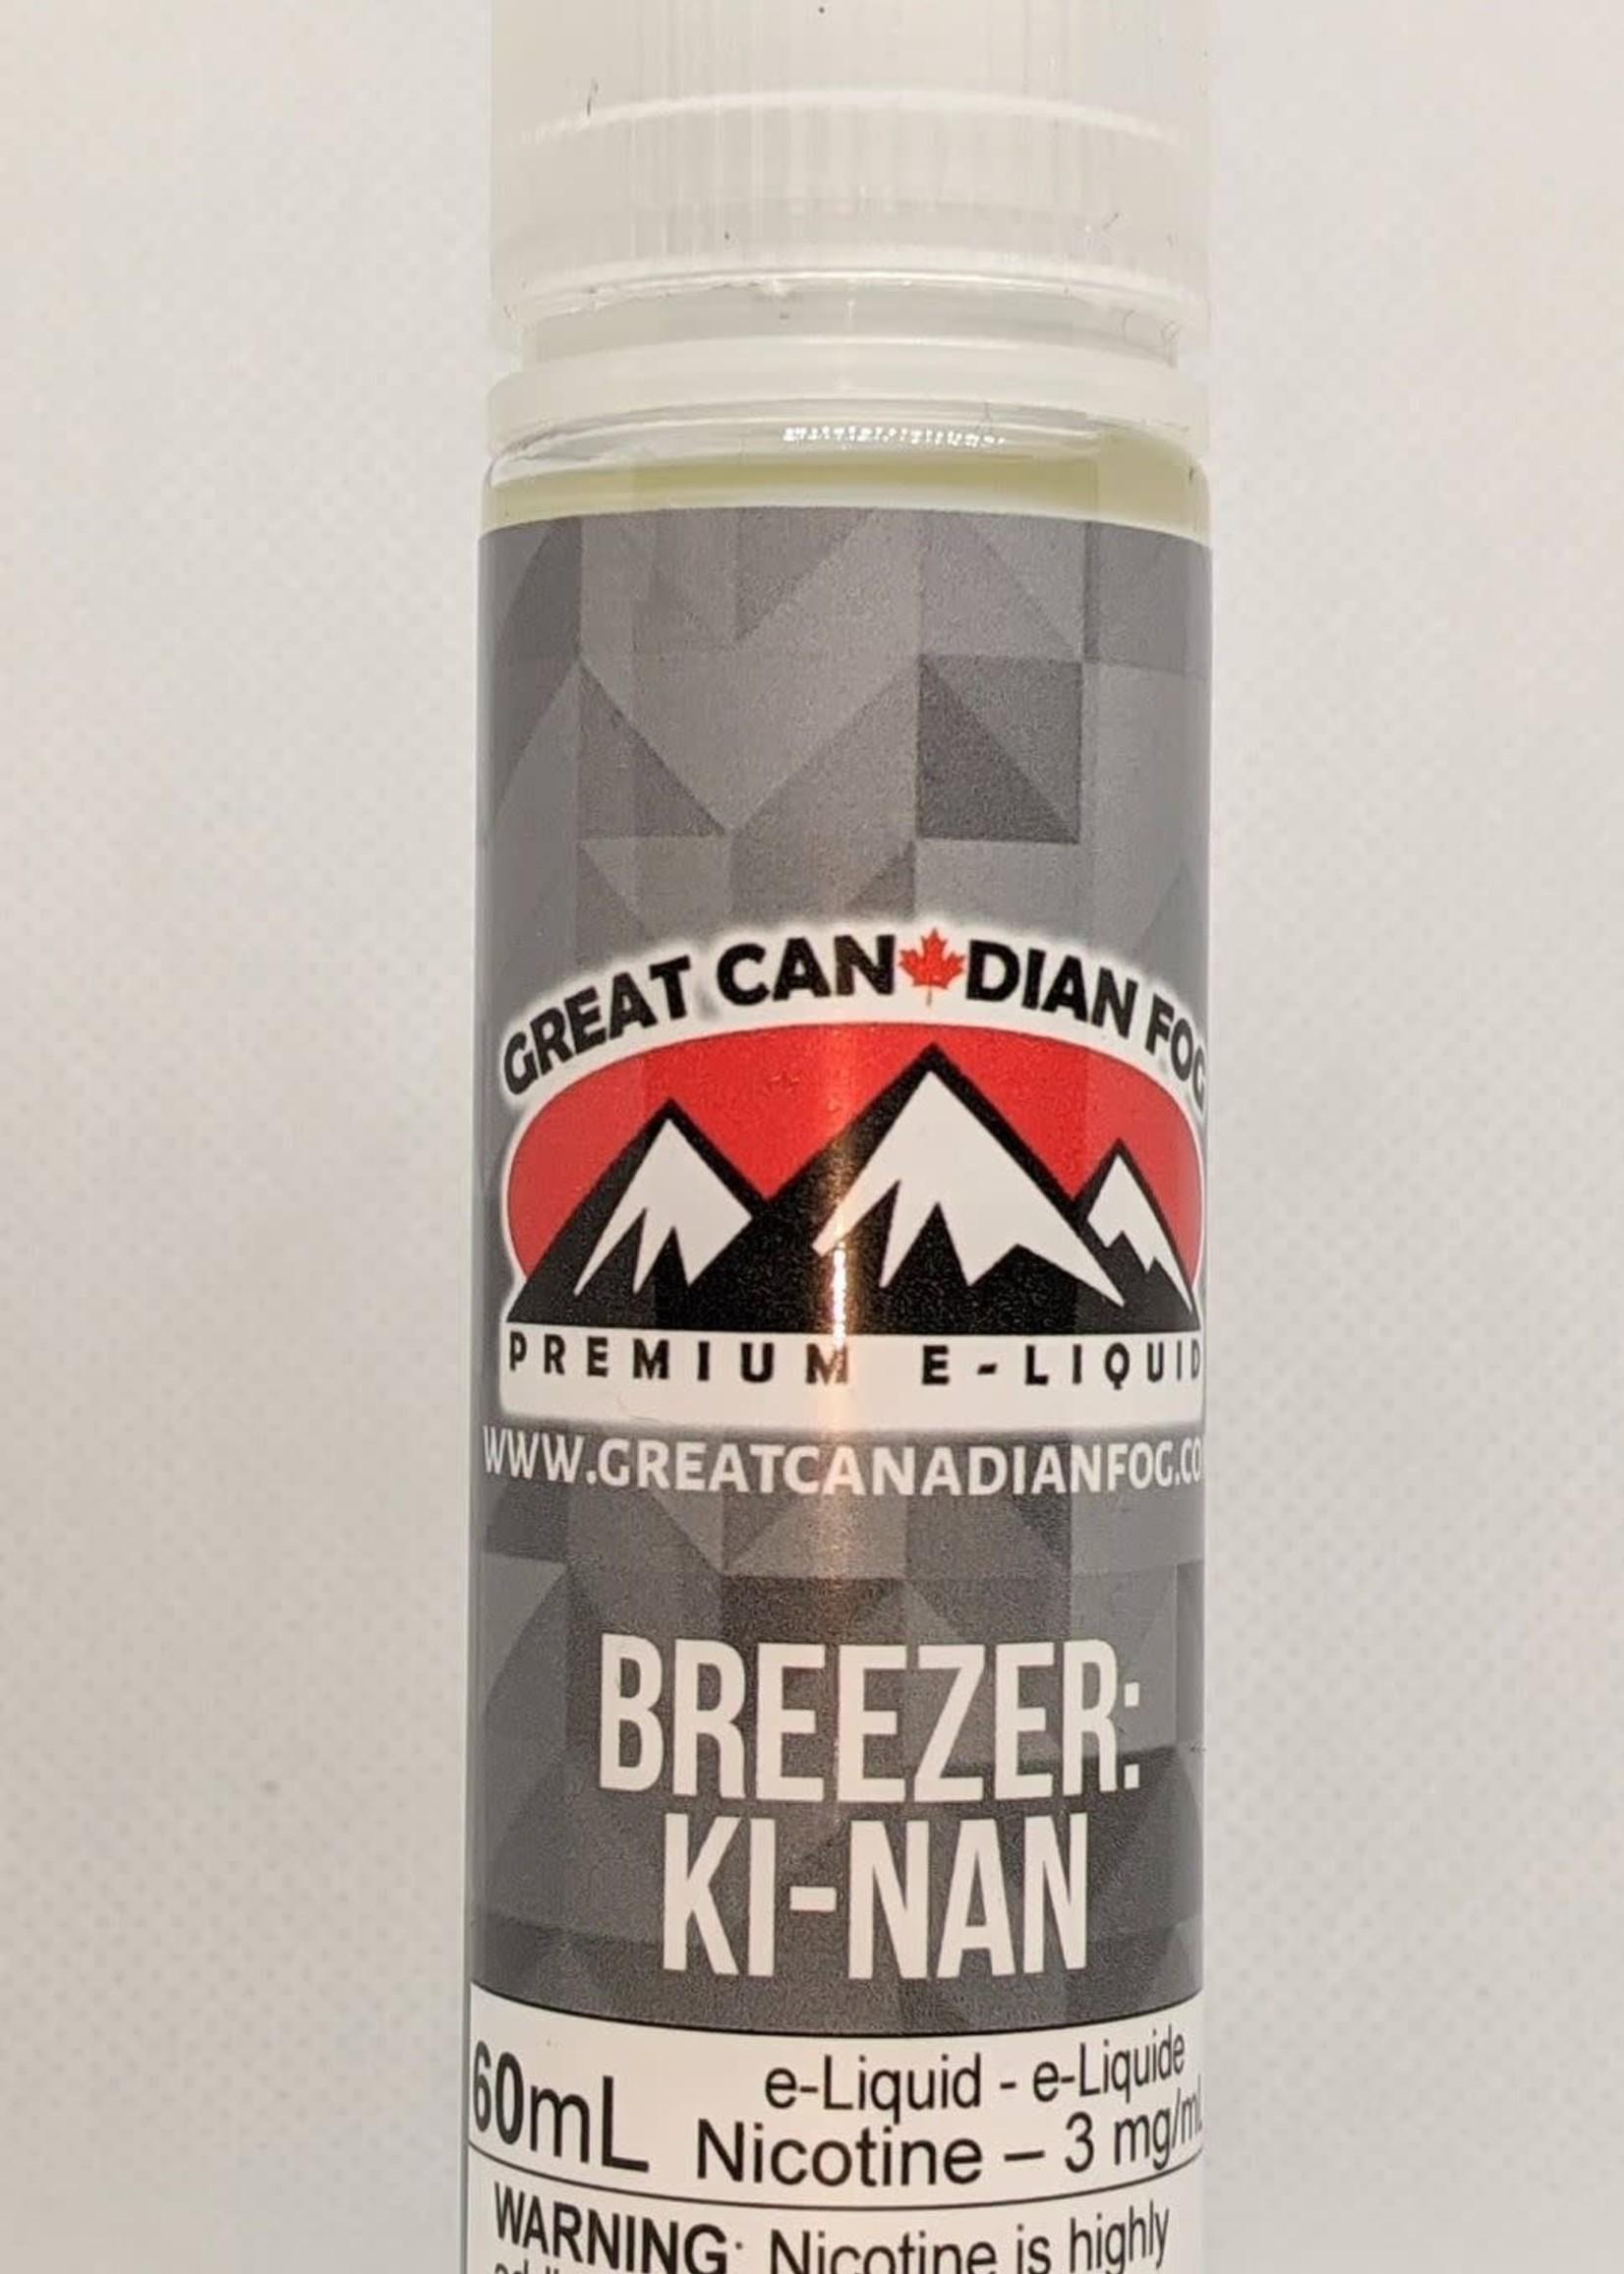 Great Canadian Fog Ki-Nan